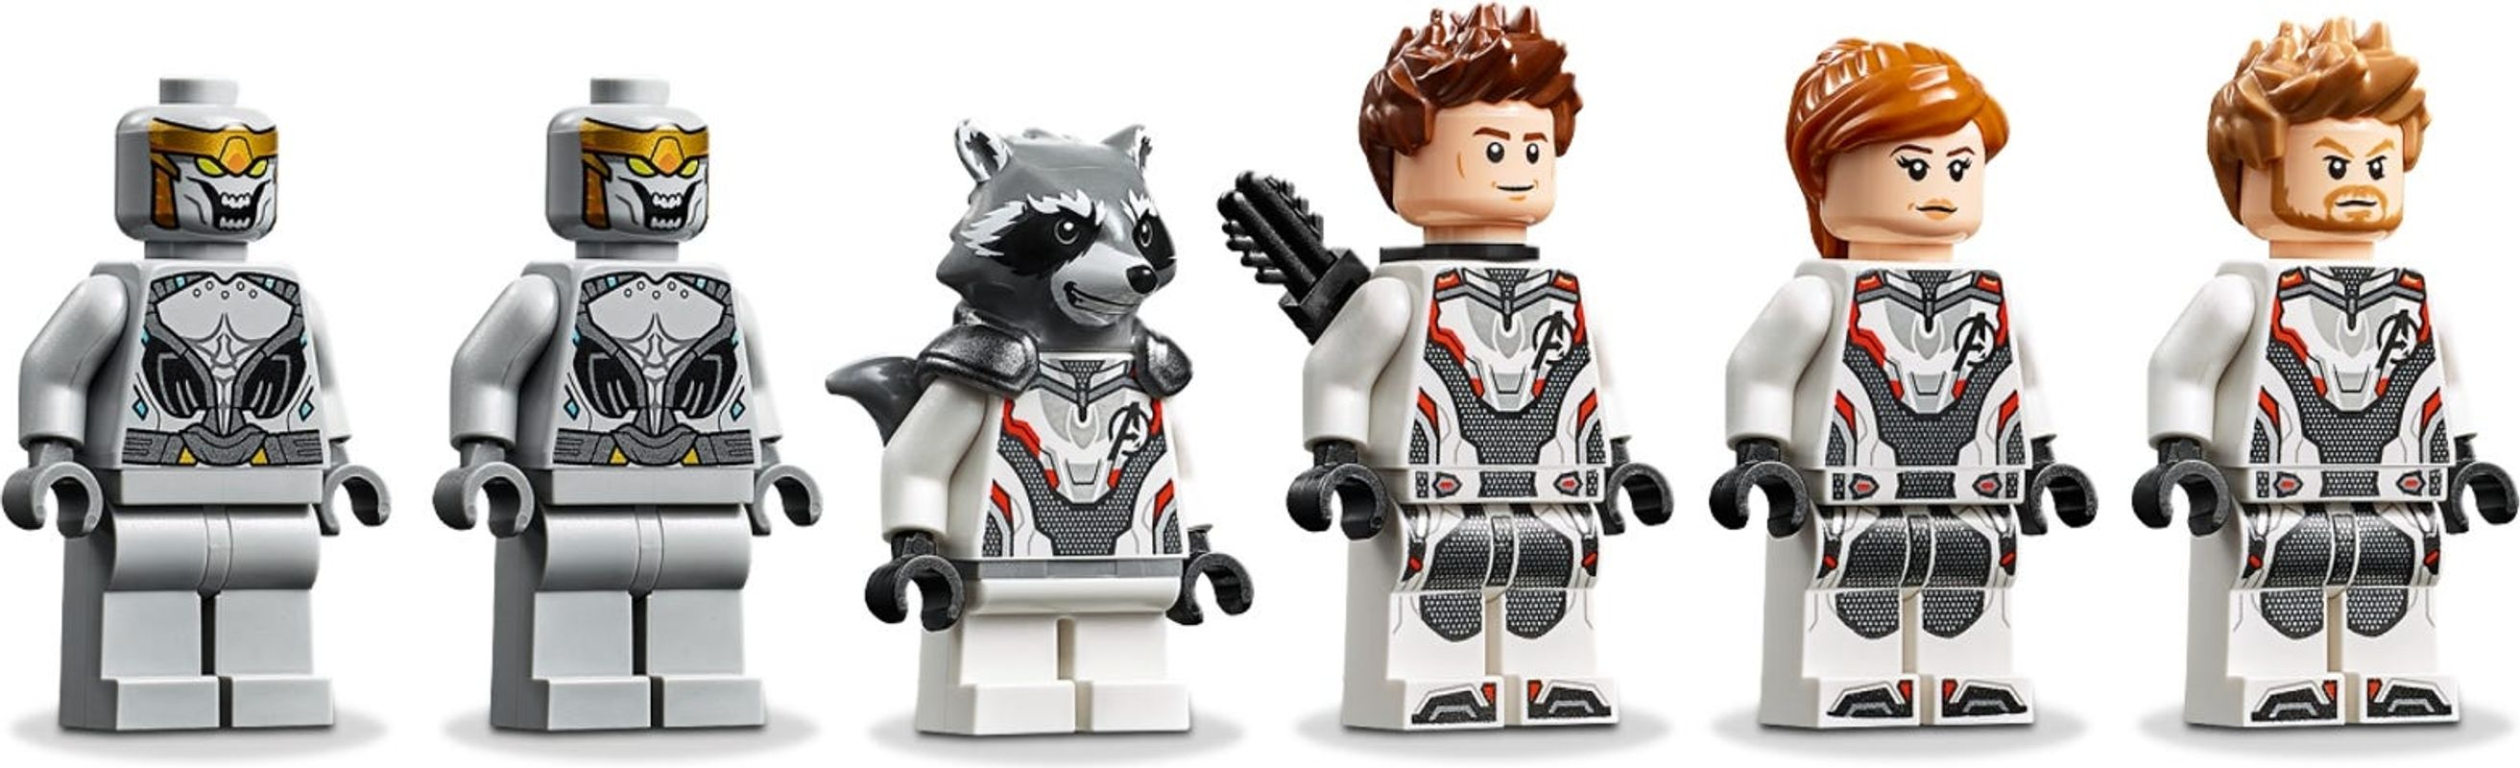 Avengers Ultimate Quinjet minifigures